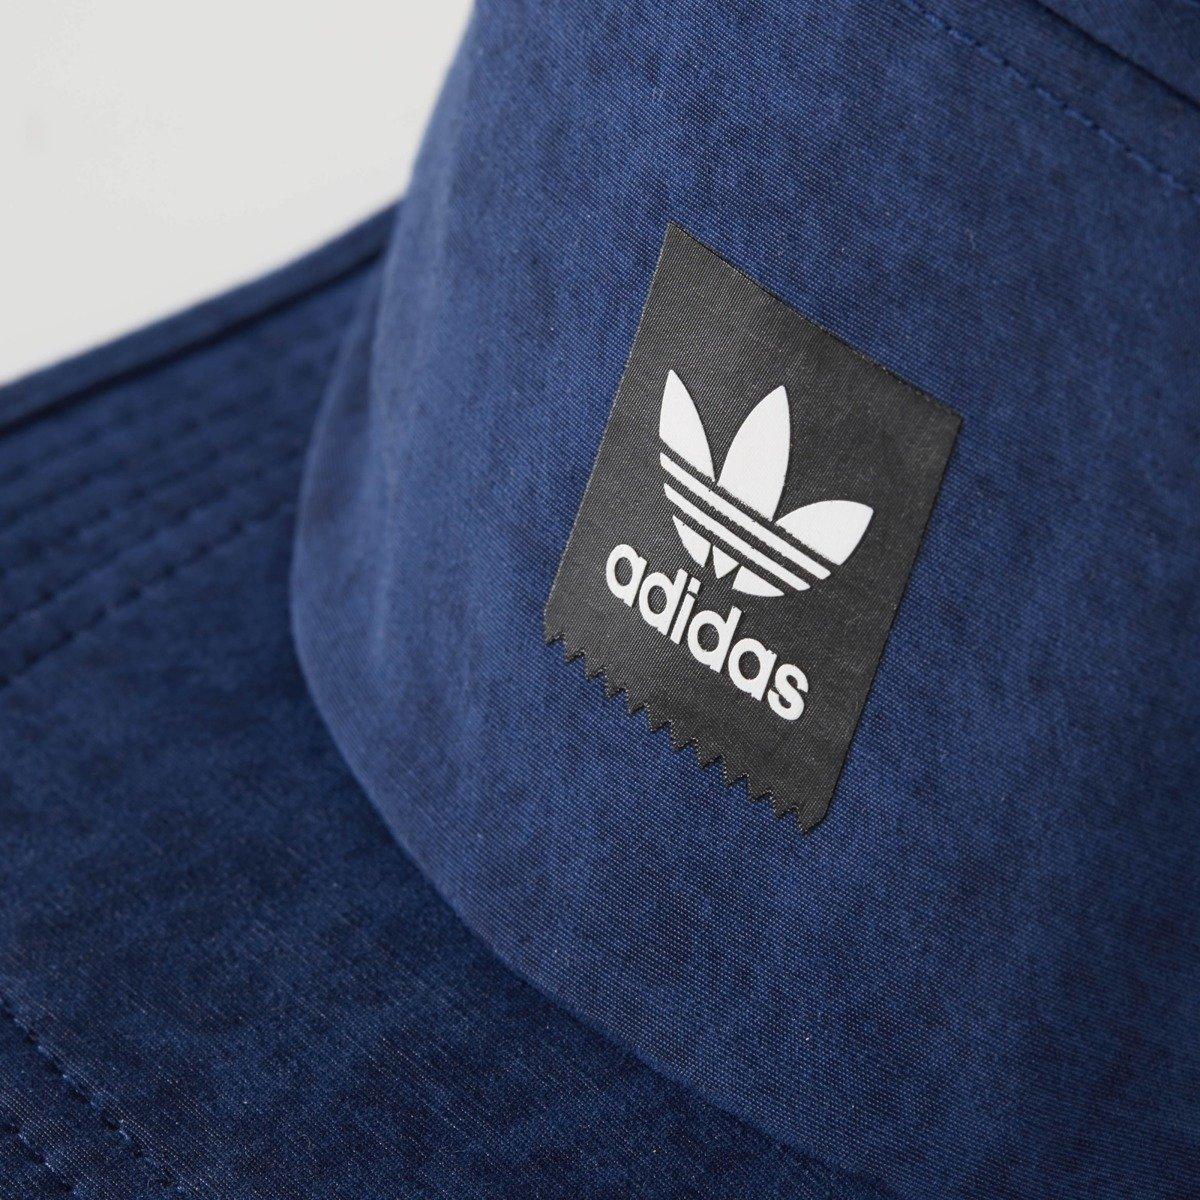 c3f968d1819 ... czapka adidas nautical 5panel mystery blue Click to zoom ...